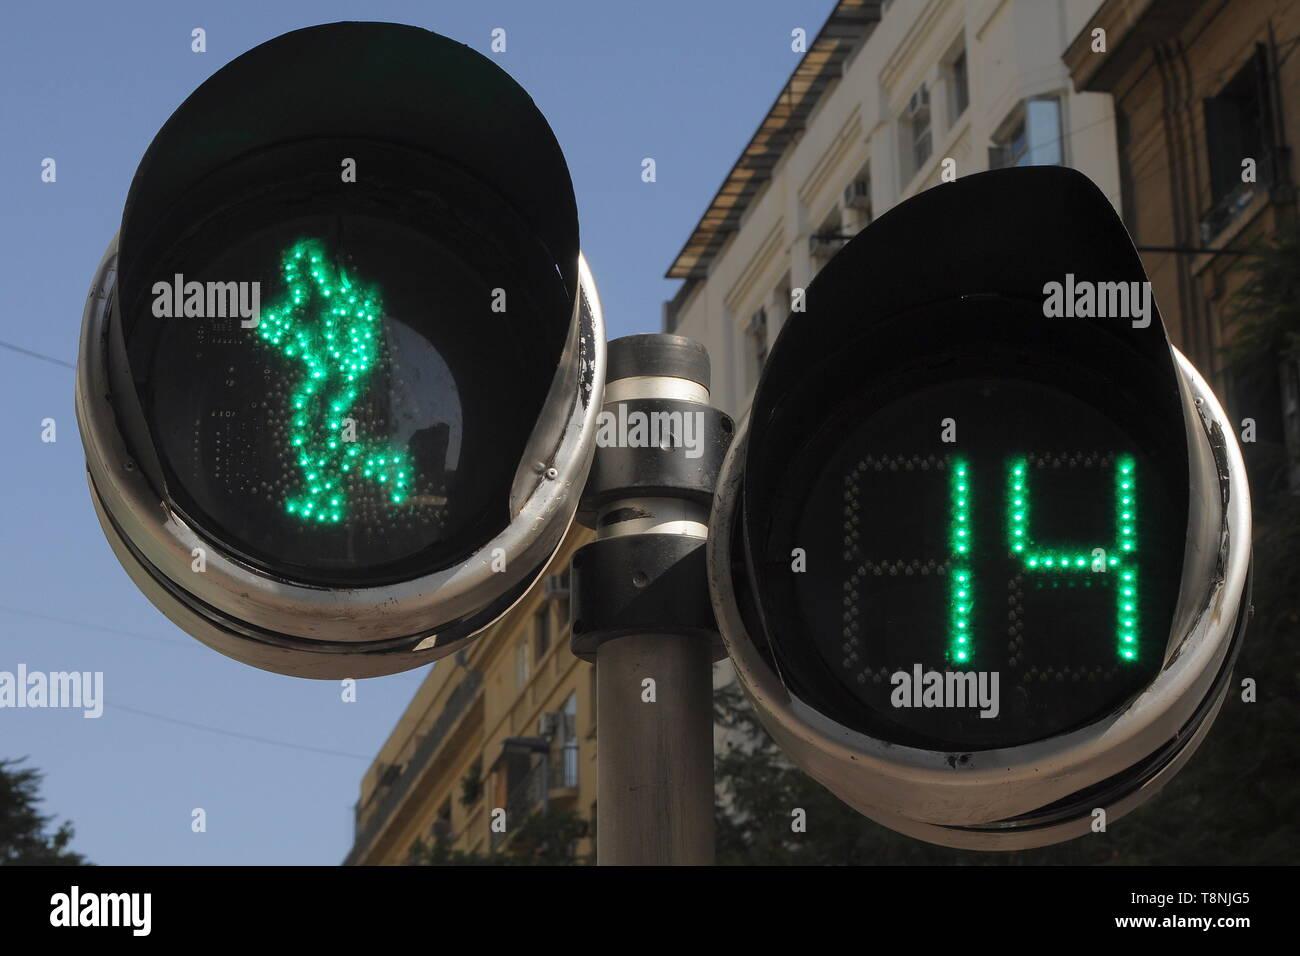 PEDESTRIAN CROSSING LIGHTS IN SANTIAGO - GREEN, WALK ACROSS, 14 SECONDS TO RED. - Stock Image